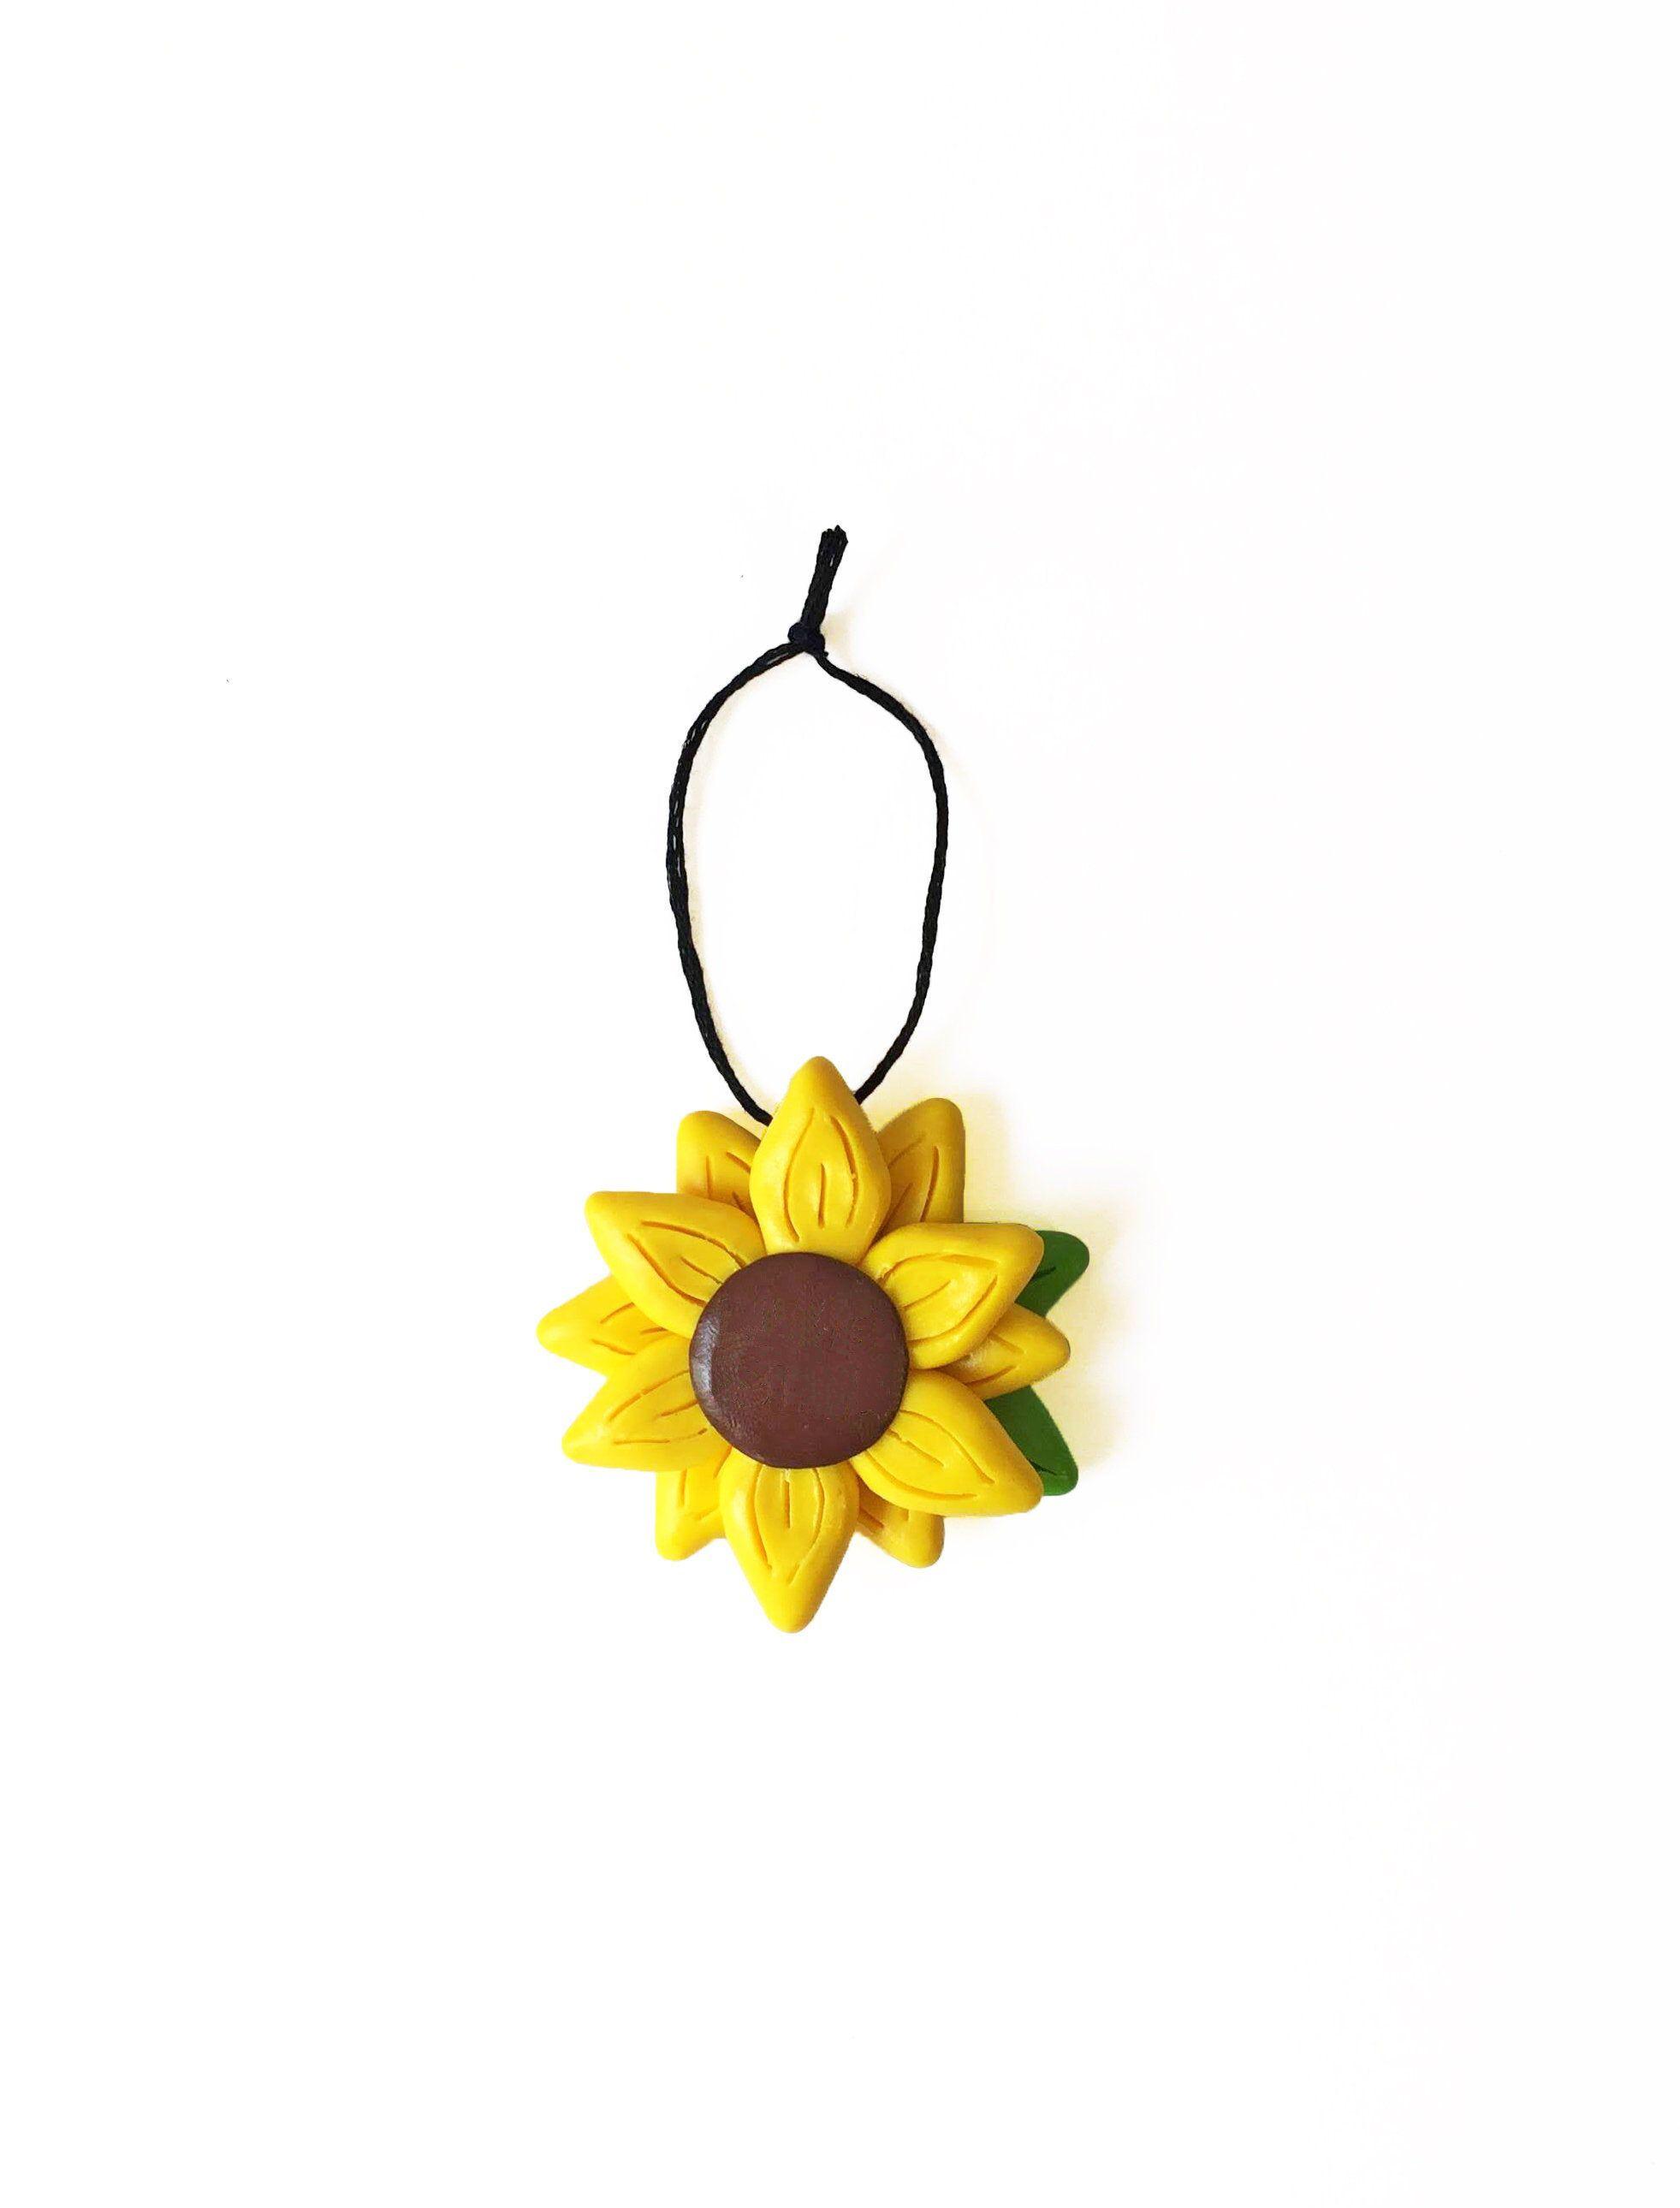 Sunflower Ornament Christmas Ornament Summer Ornament